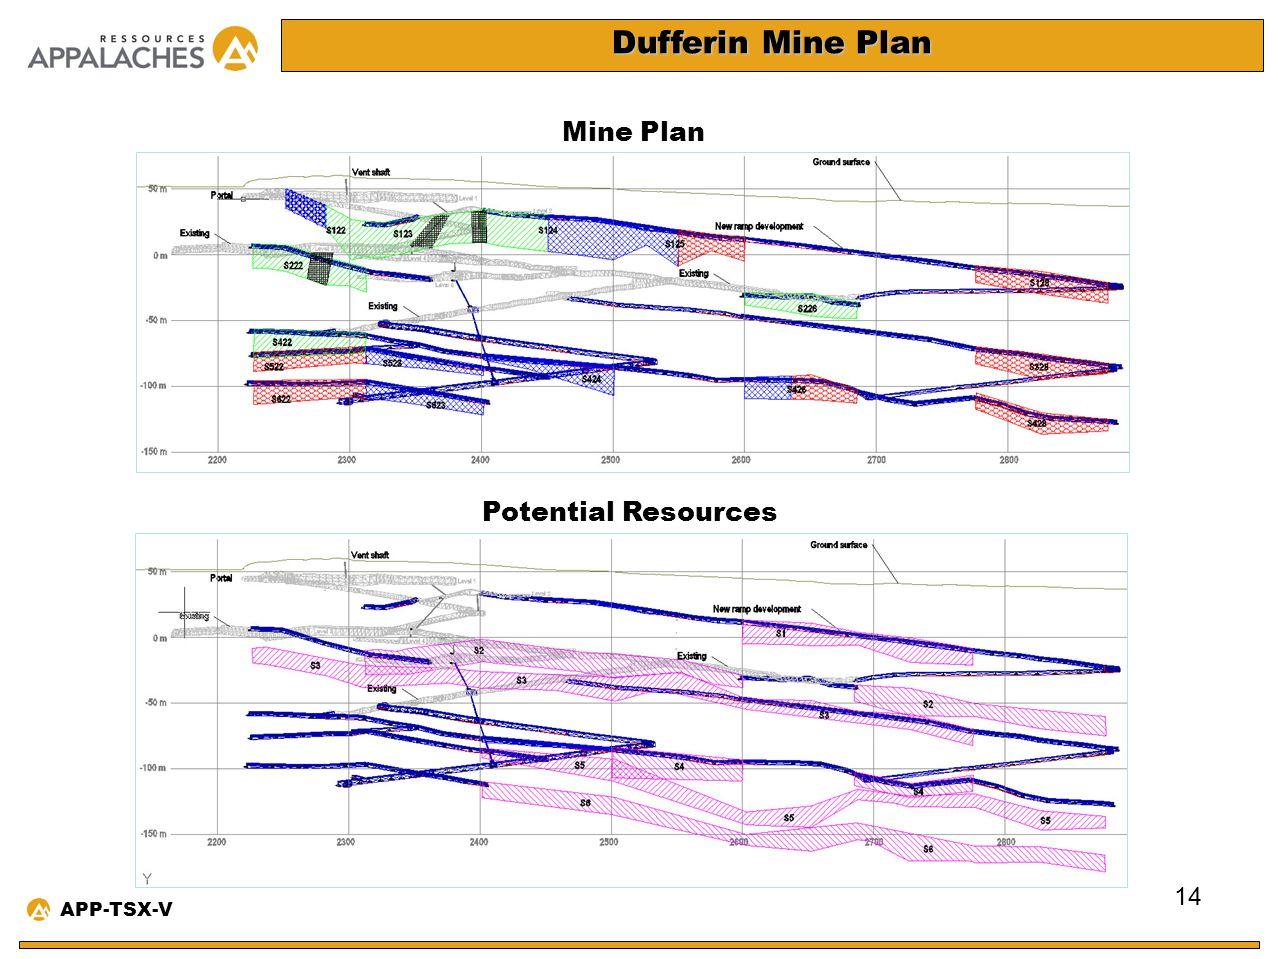 Dufferin Mine Plan 14 APP-TSX-V Potential Resources Mine Plan